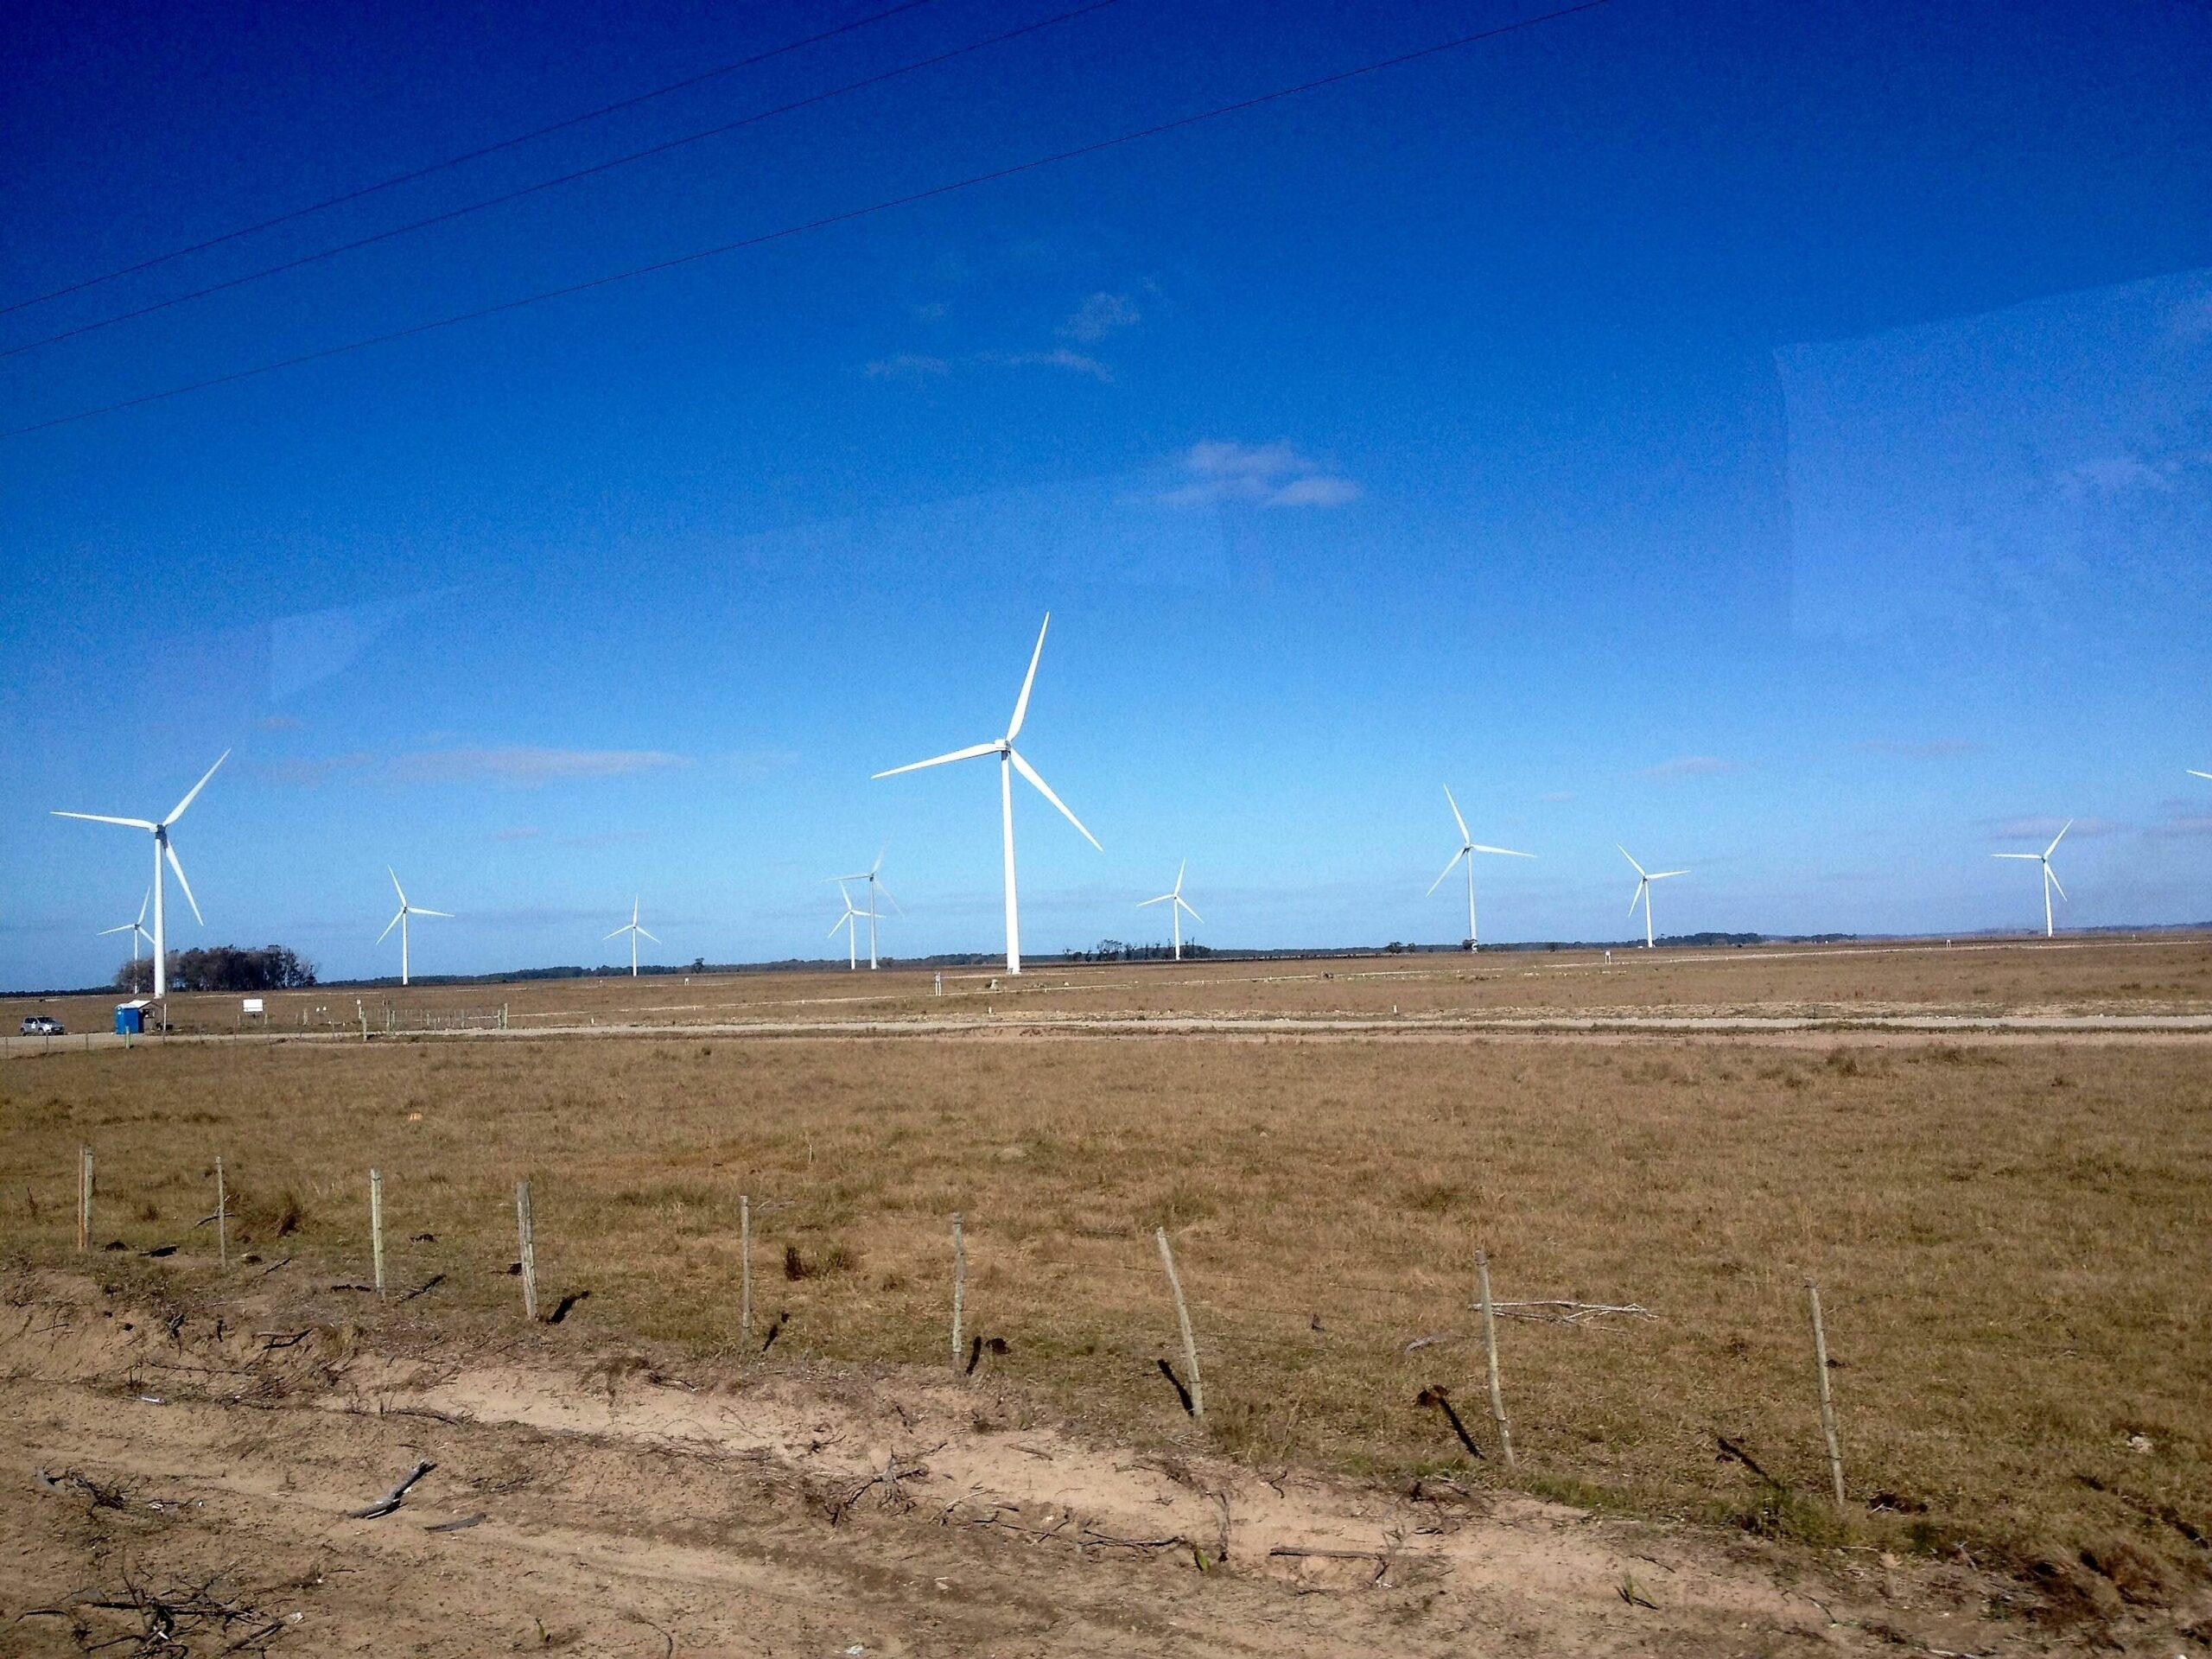 Omega Energia fecha contrato de R$ 500 mi para adquirir parque eólico da Eletrobras